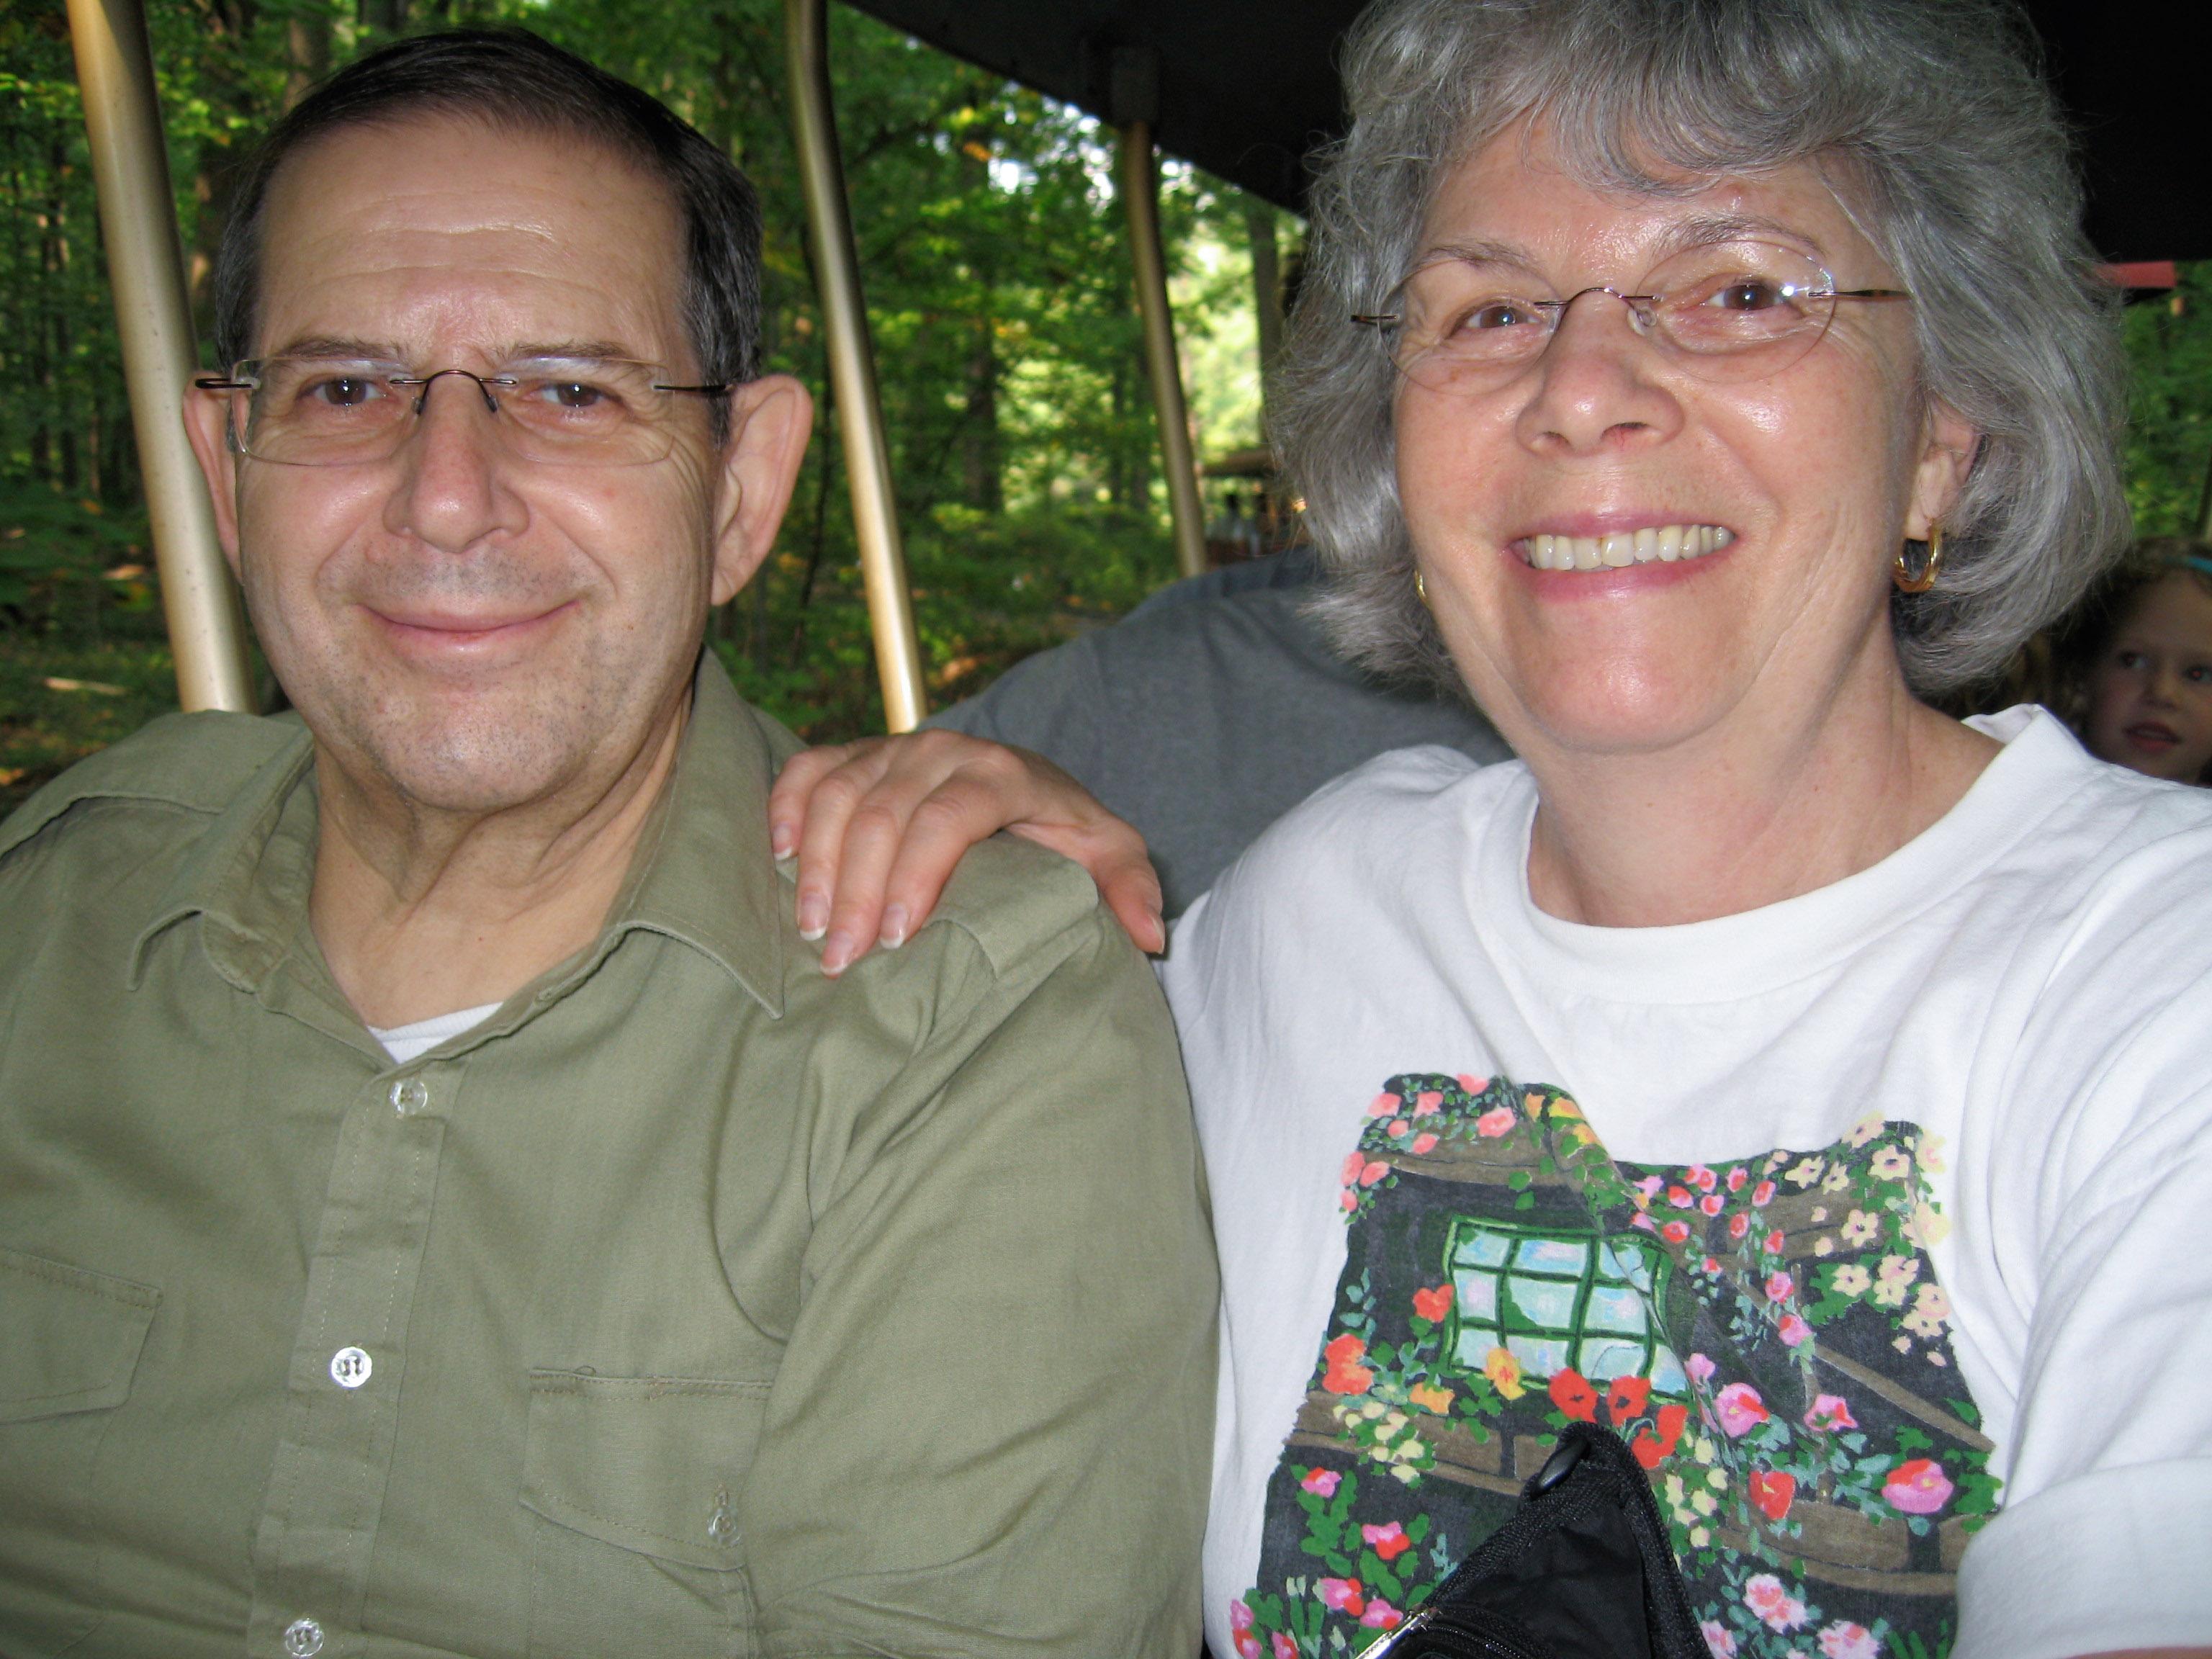 Warren Weinstein with his wife, Elaine, in an undated family photo. Weinstein, an Al-Qaeda hostage, was killed in an American drone strike. (bringwarrenhome.com)